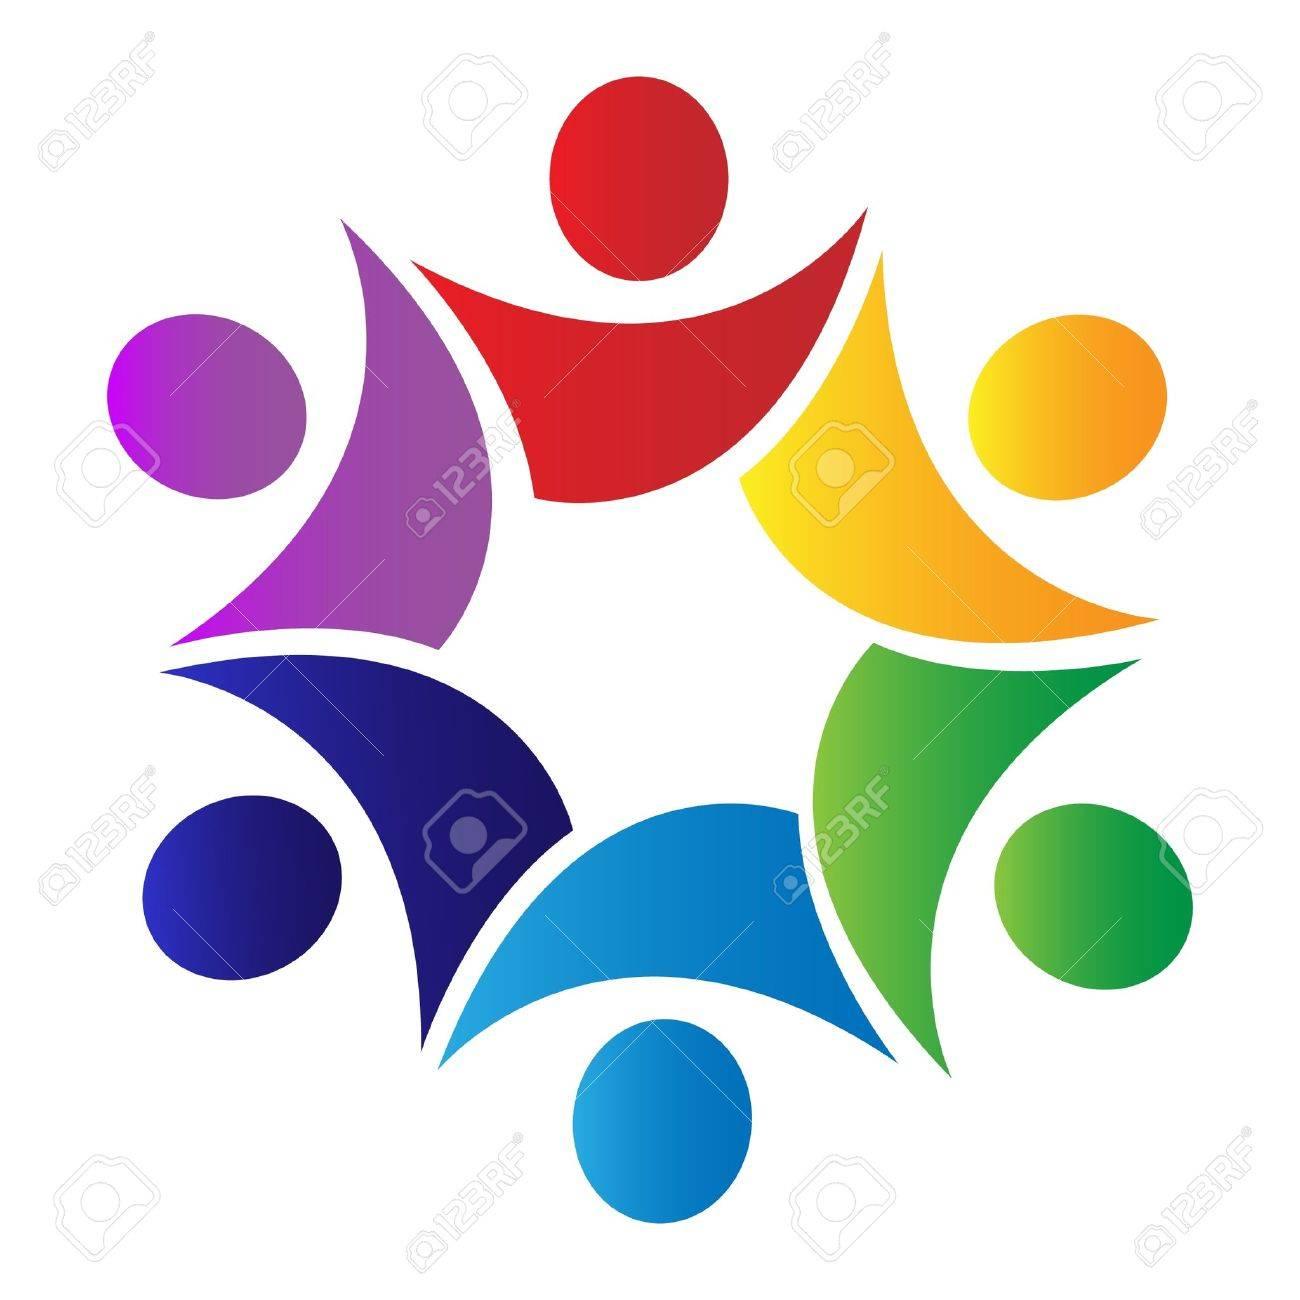 Teamwork solutions logo - 12490859